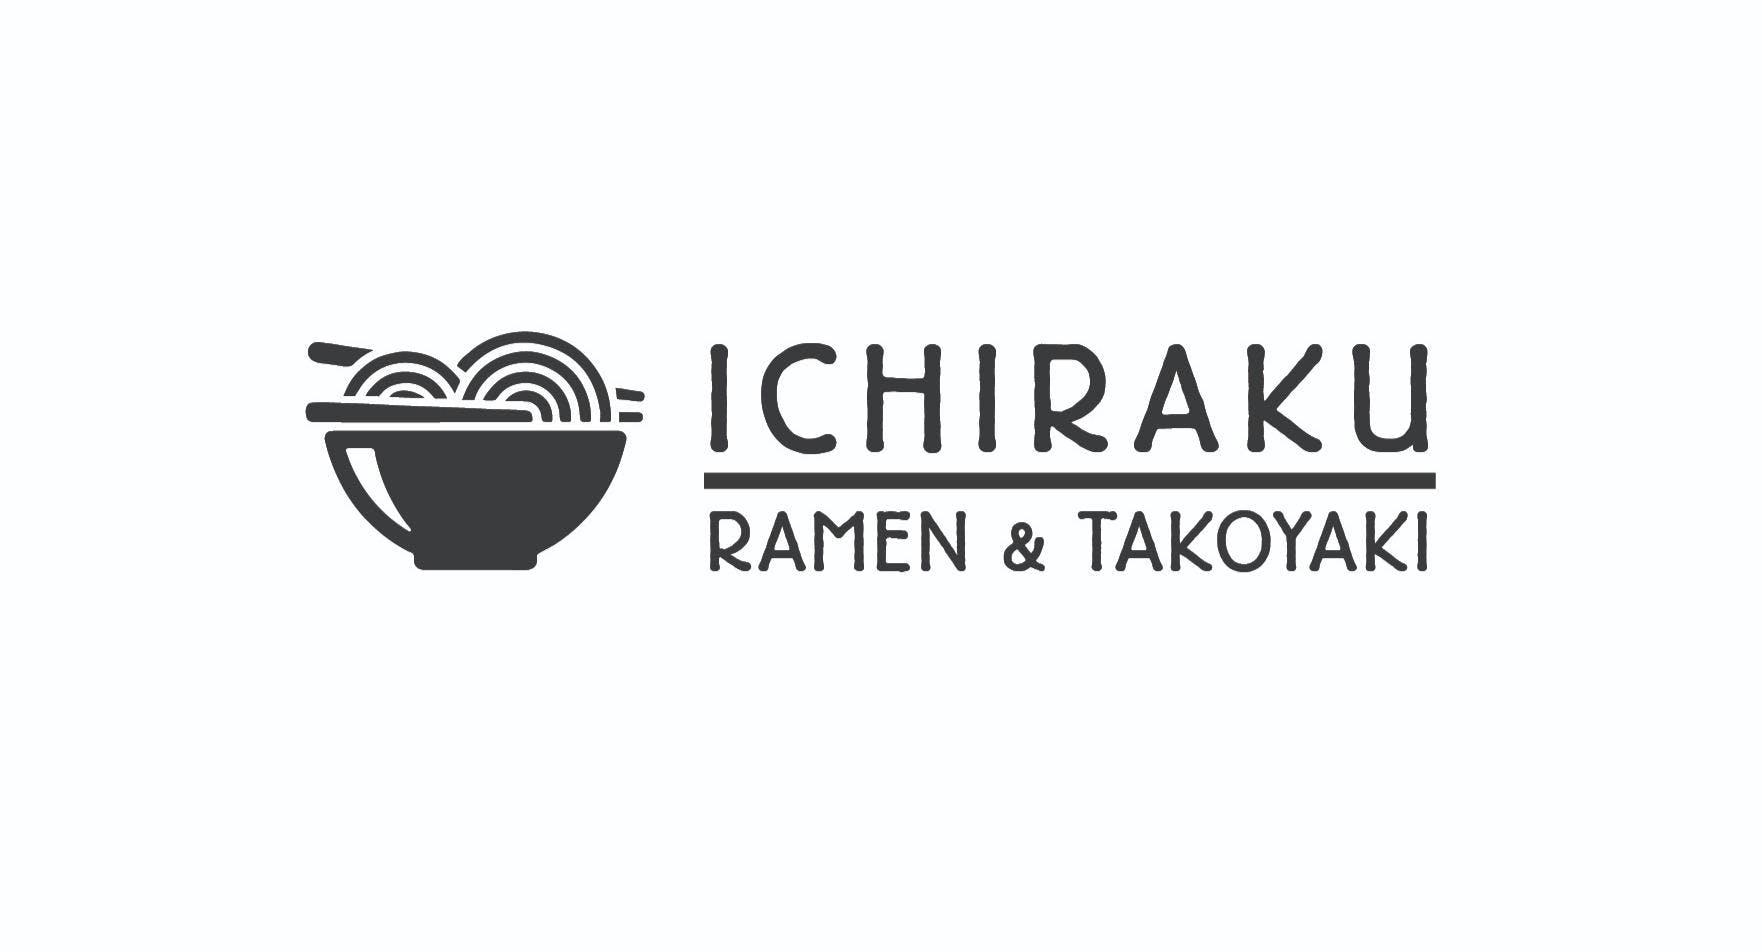 ICHIRAKU Ramen & Takoyaki Roma image 1